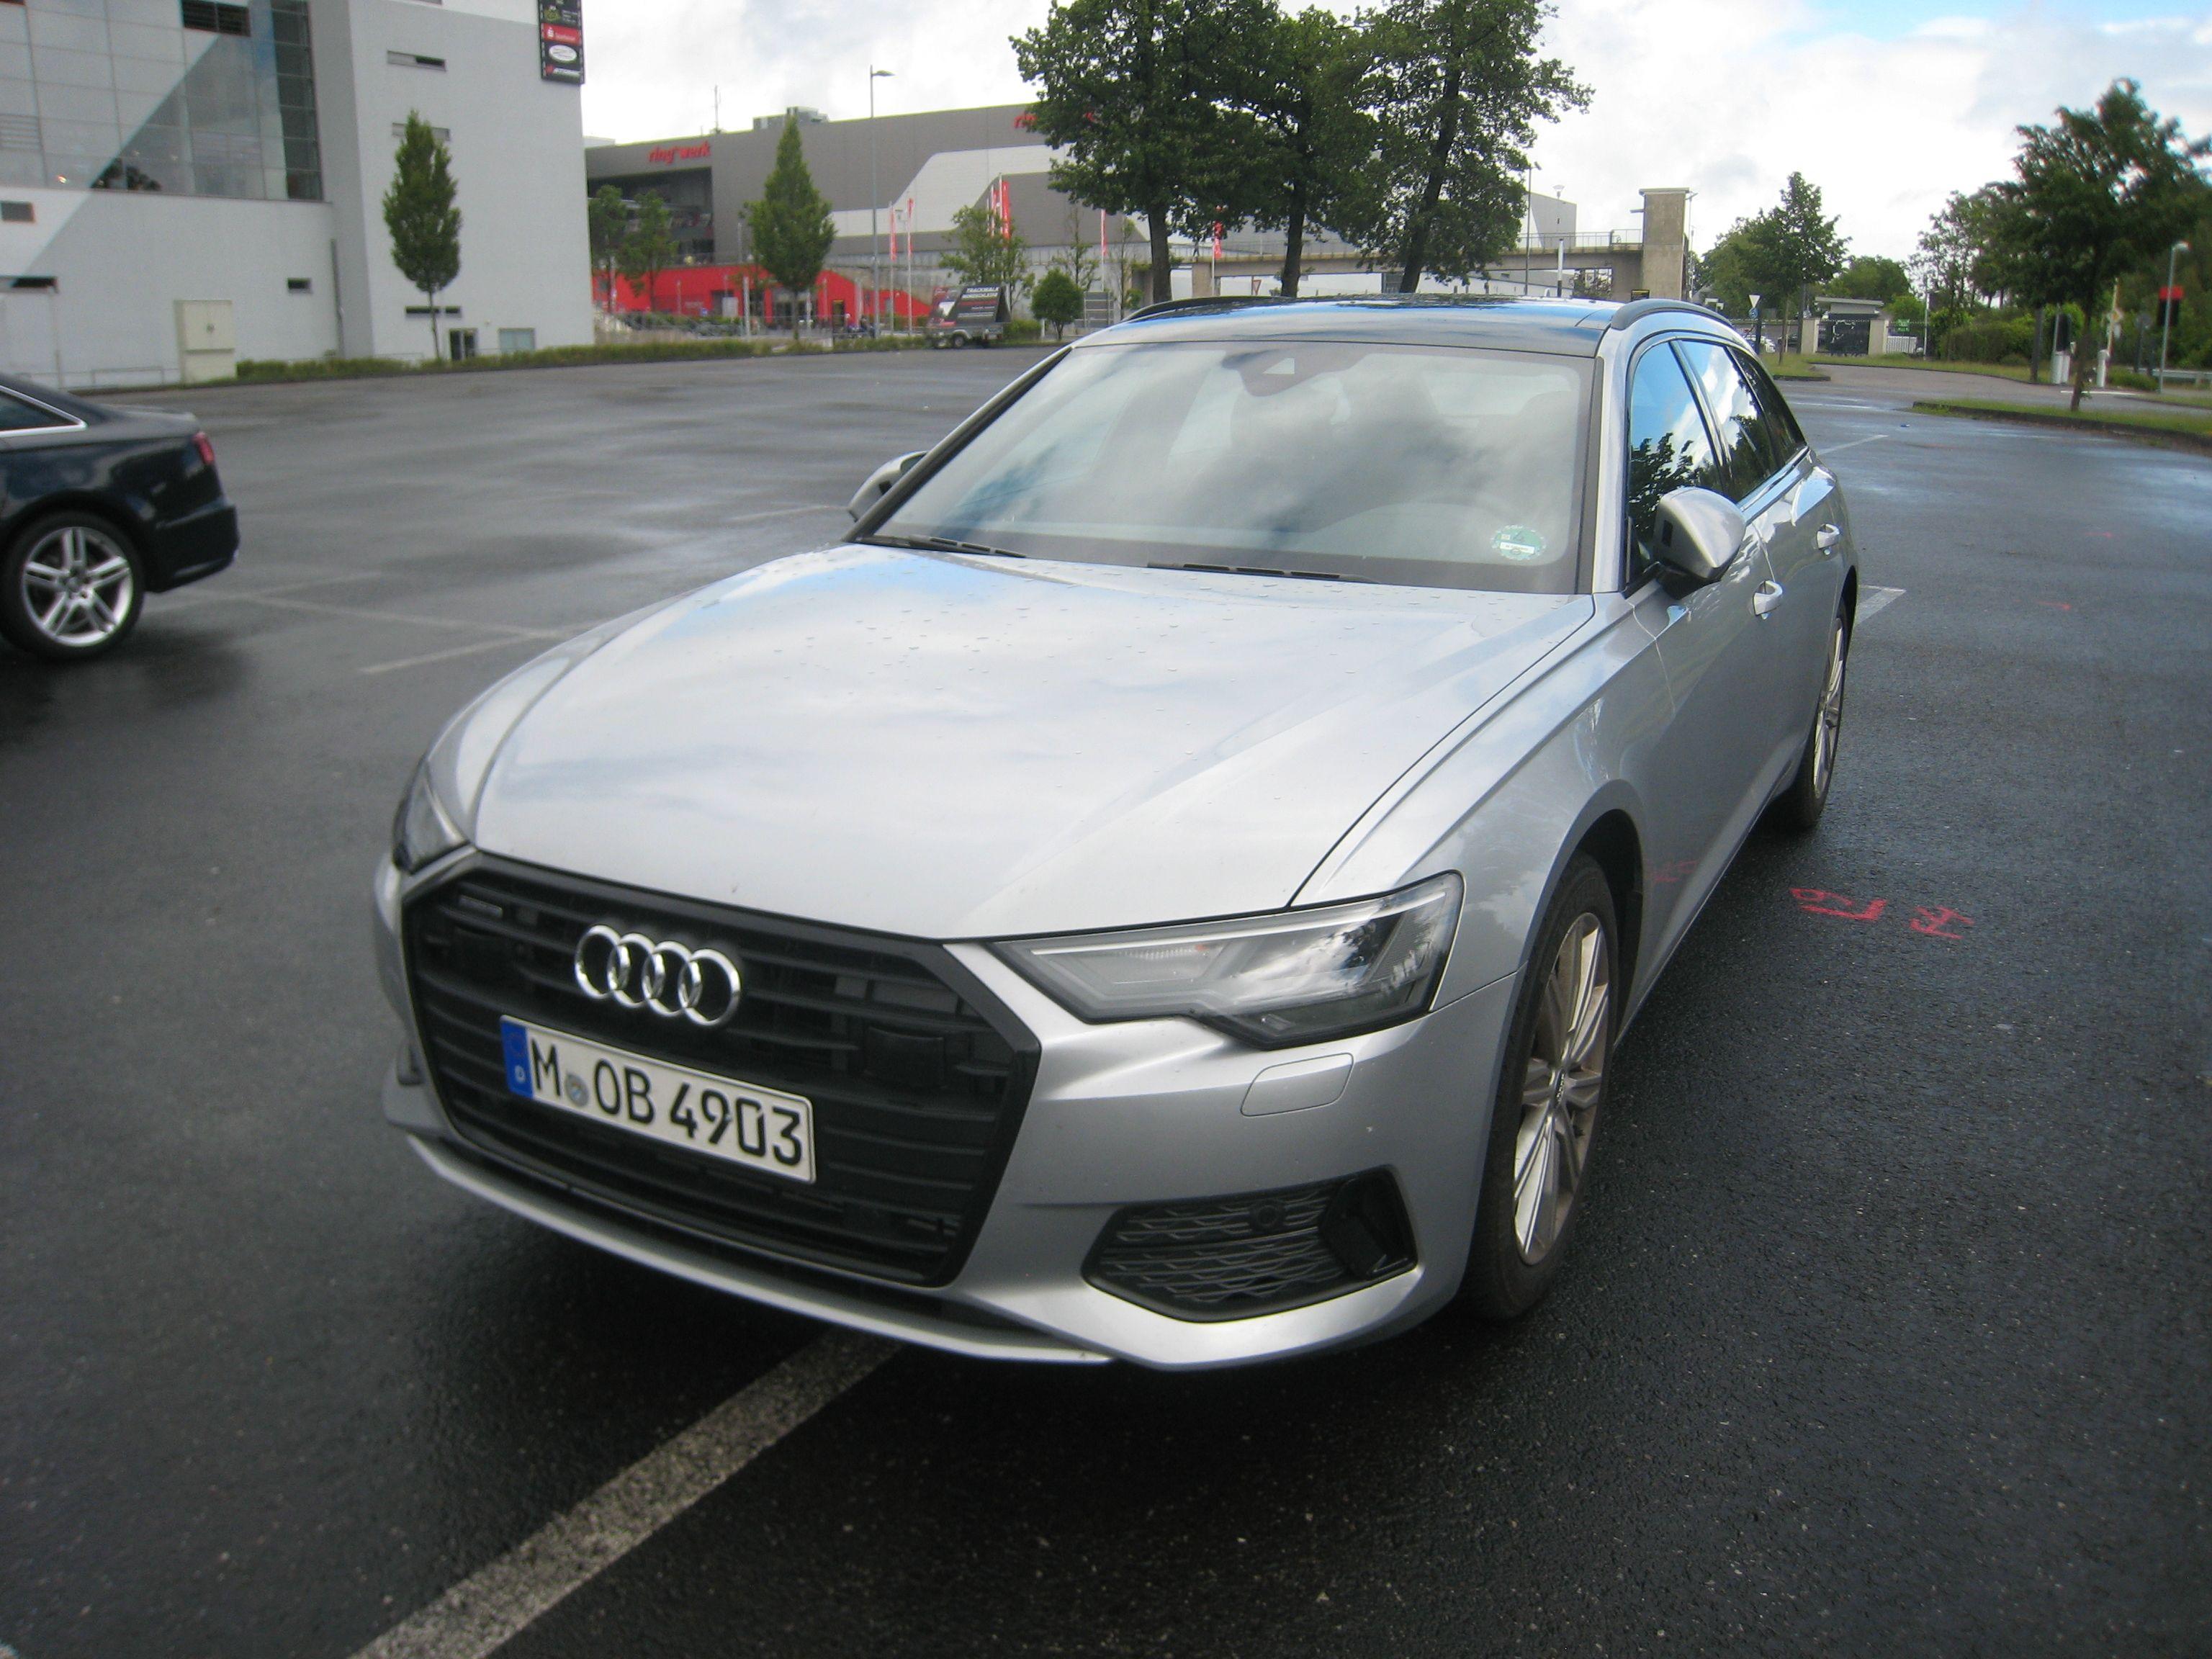 Kelebihan Kekurangan Audi Combi Murah Berkualitas